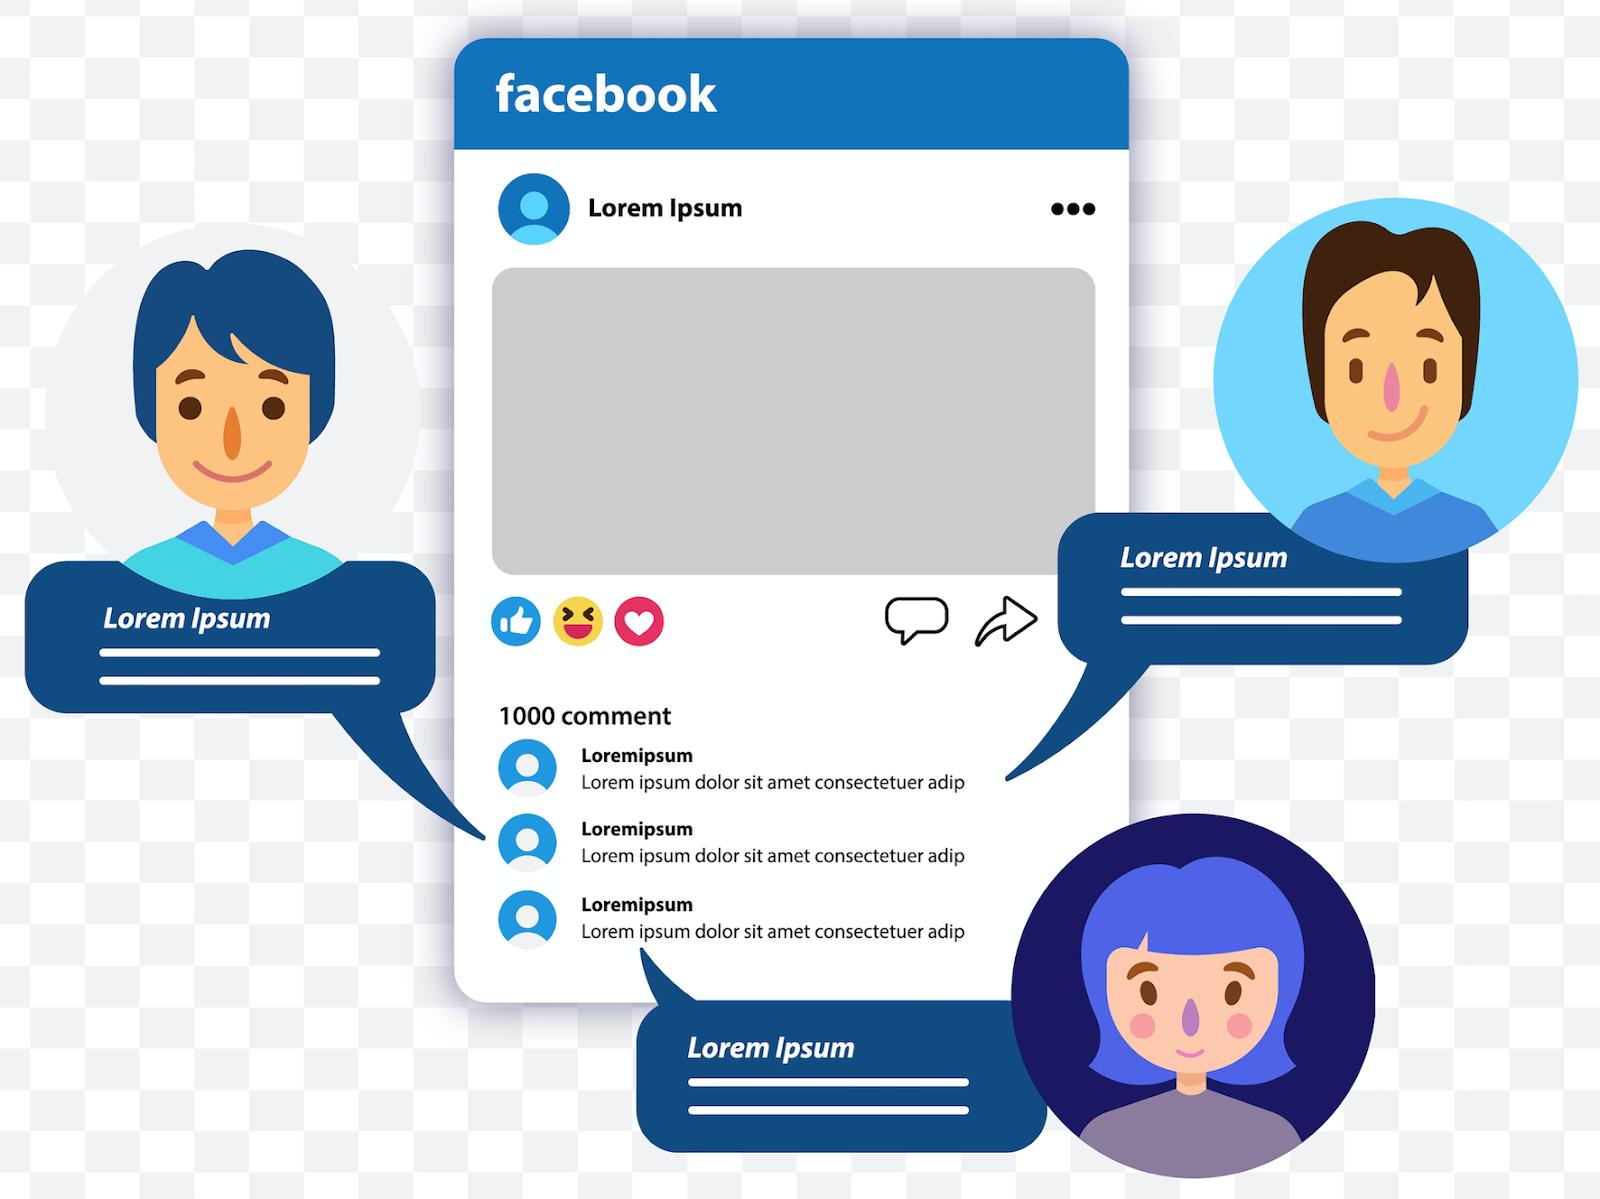 "Phần ""cụ thể"" bạn diền nội dung lỗi đang sảy ra với account của mình. Để được giải quyết mau chóng nội dung bạn gõ nội dung sau ""I think Facebook is confusion in the key features of my account. I've done a full charter of kênh Facebook. Hope review, thank for your Facebook Team""."